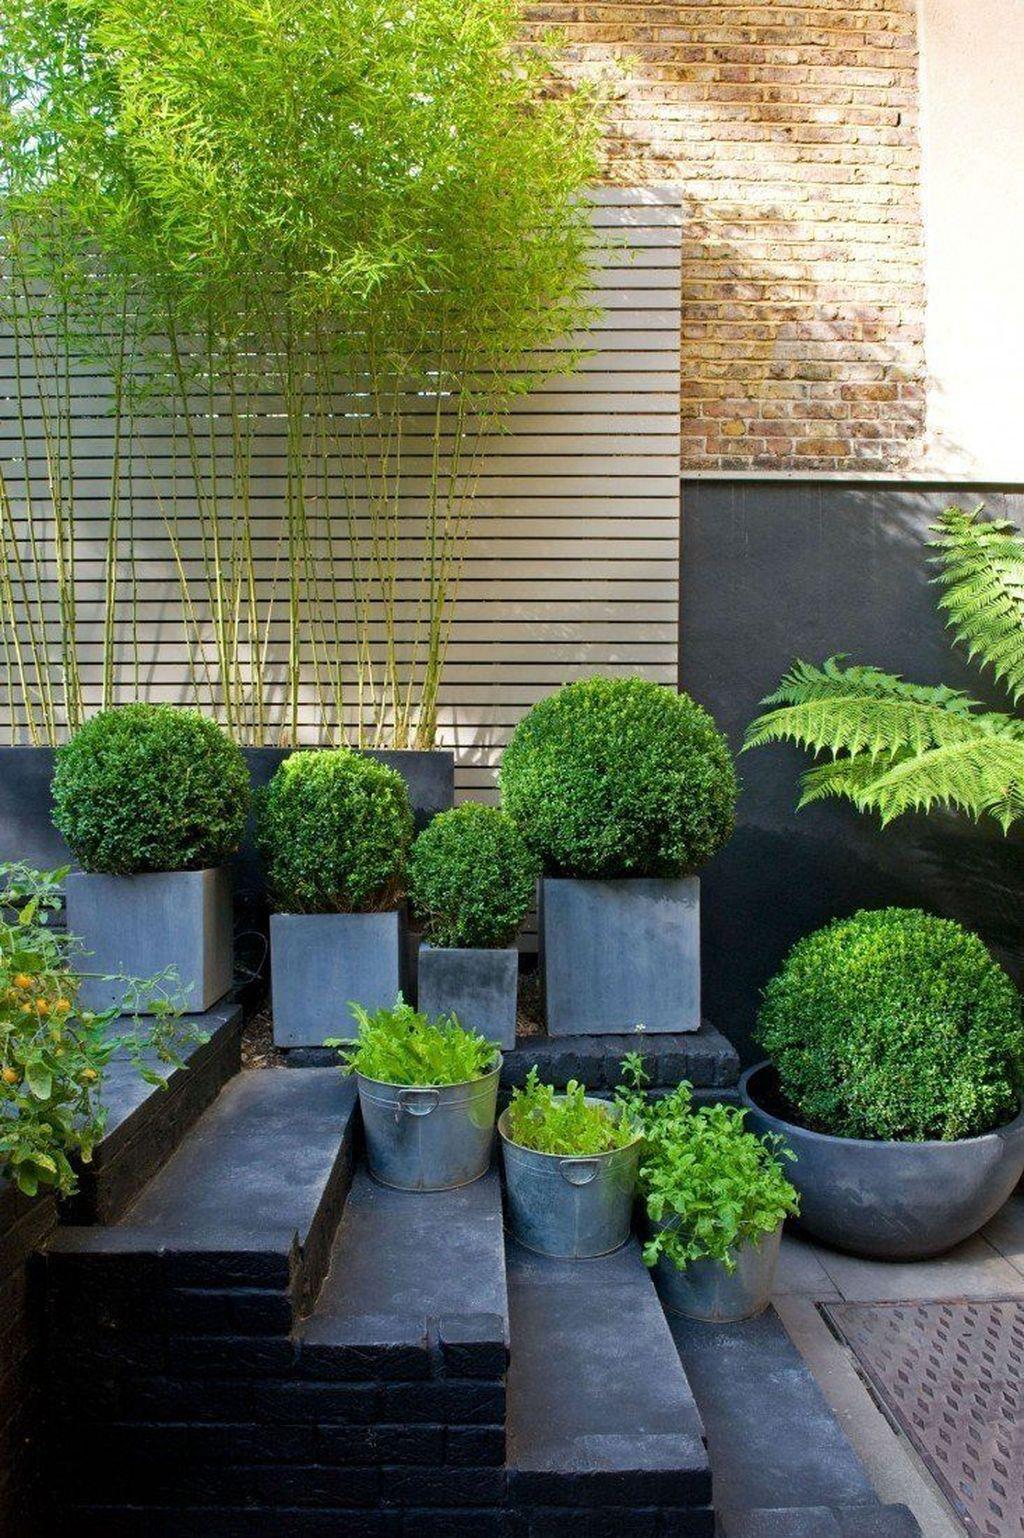 The Best Urban Garden Design Ideas For Your Backyard 24